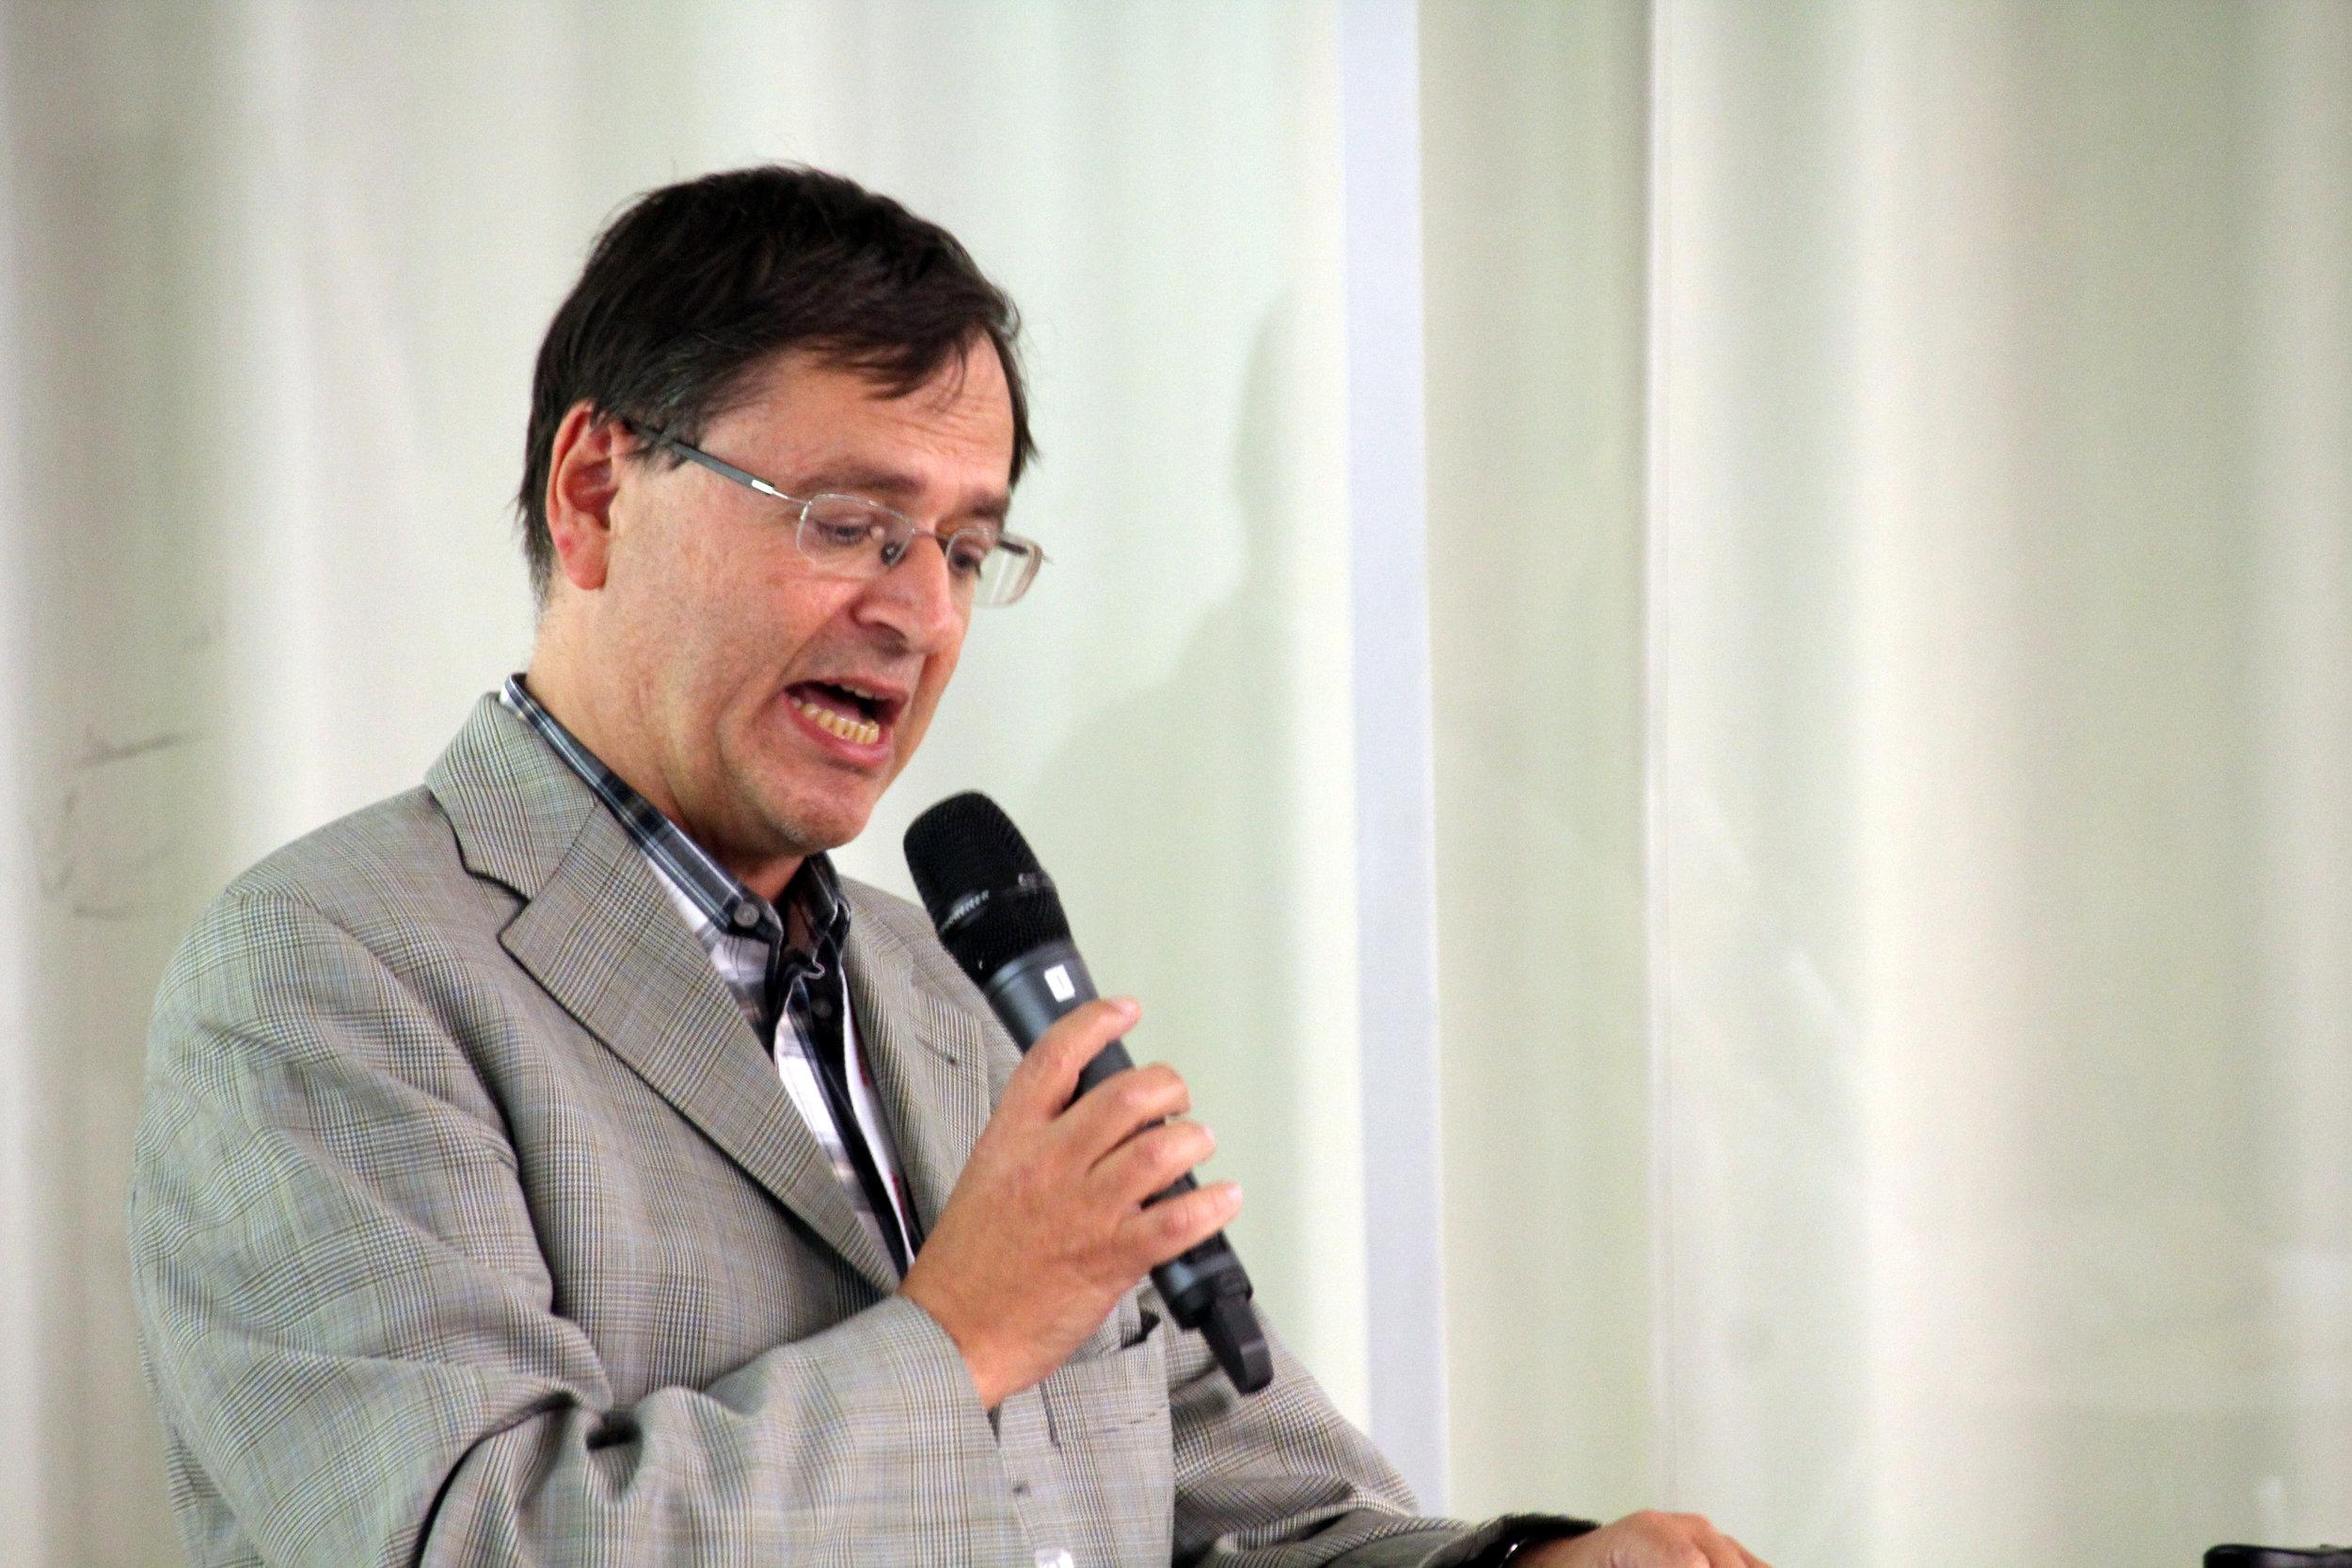 Welcome Address by Thomas Gartmann (Berne)